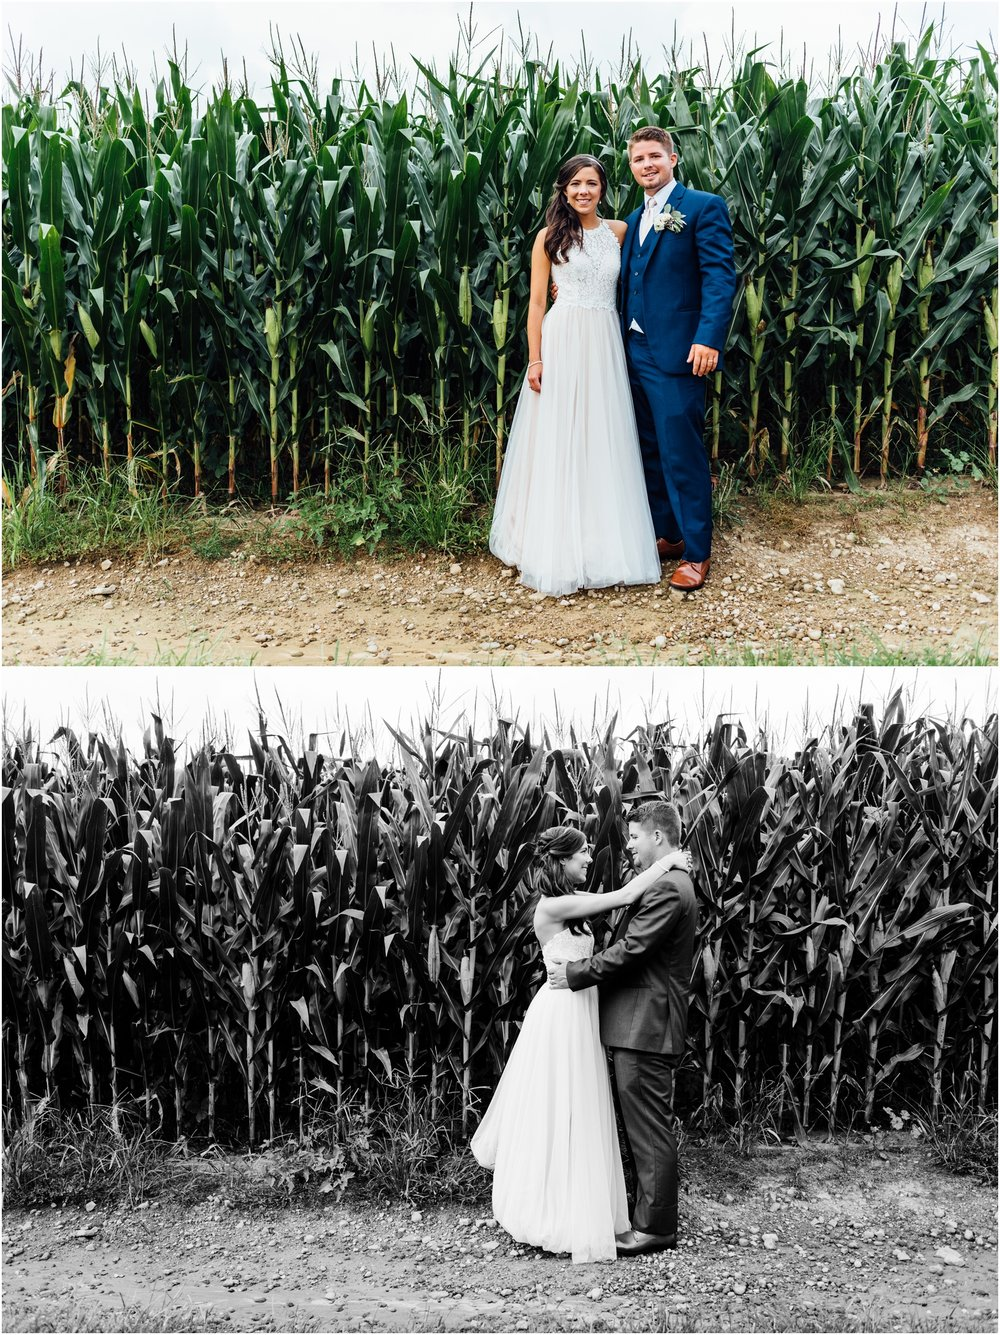 Steph&Bryan_Lancaster_wedding_farm_0551.jpg